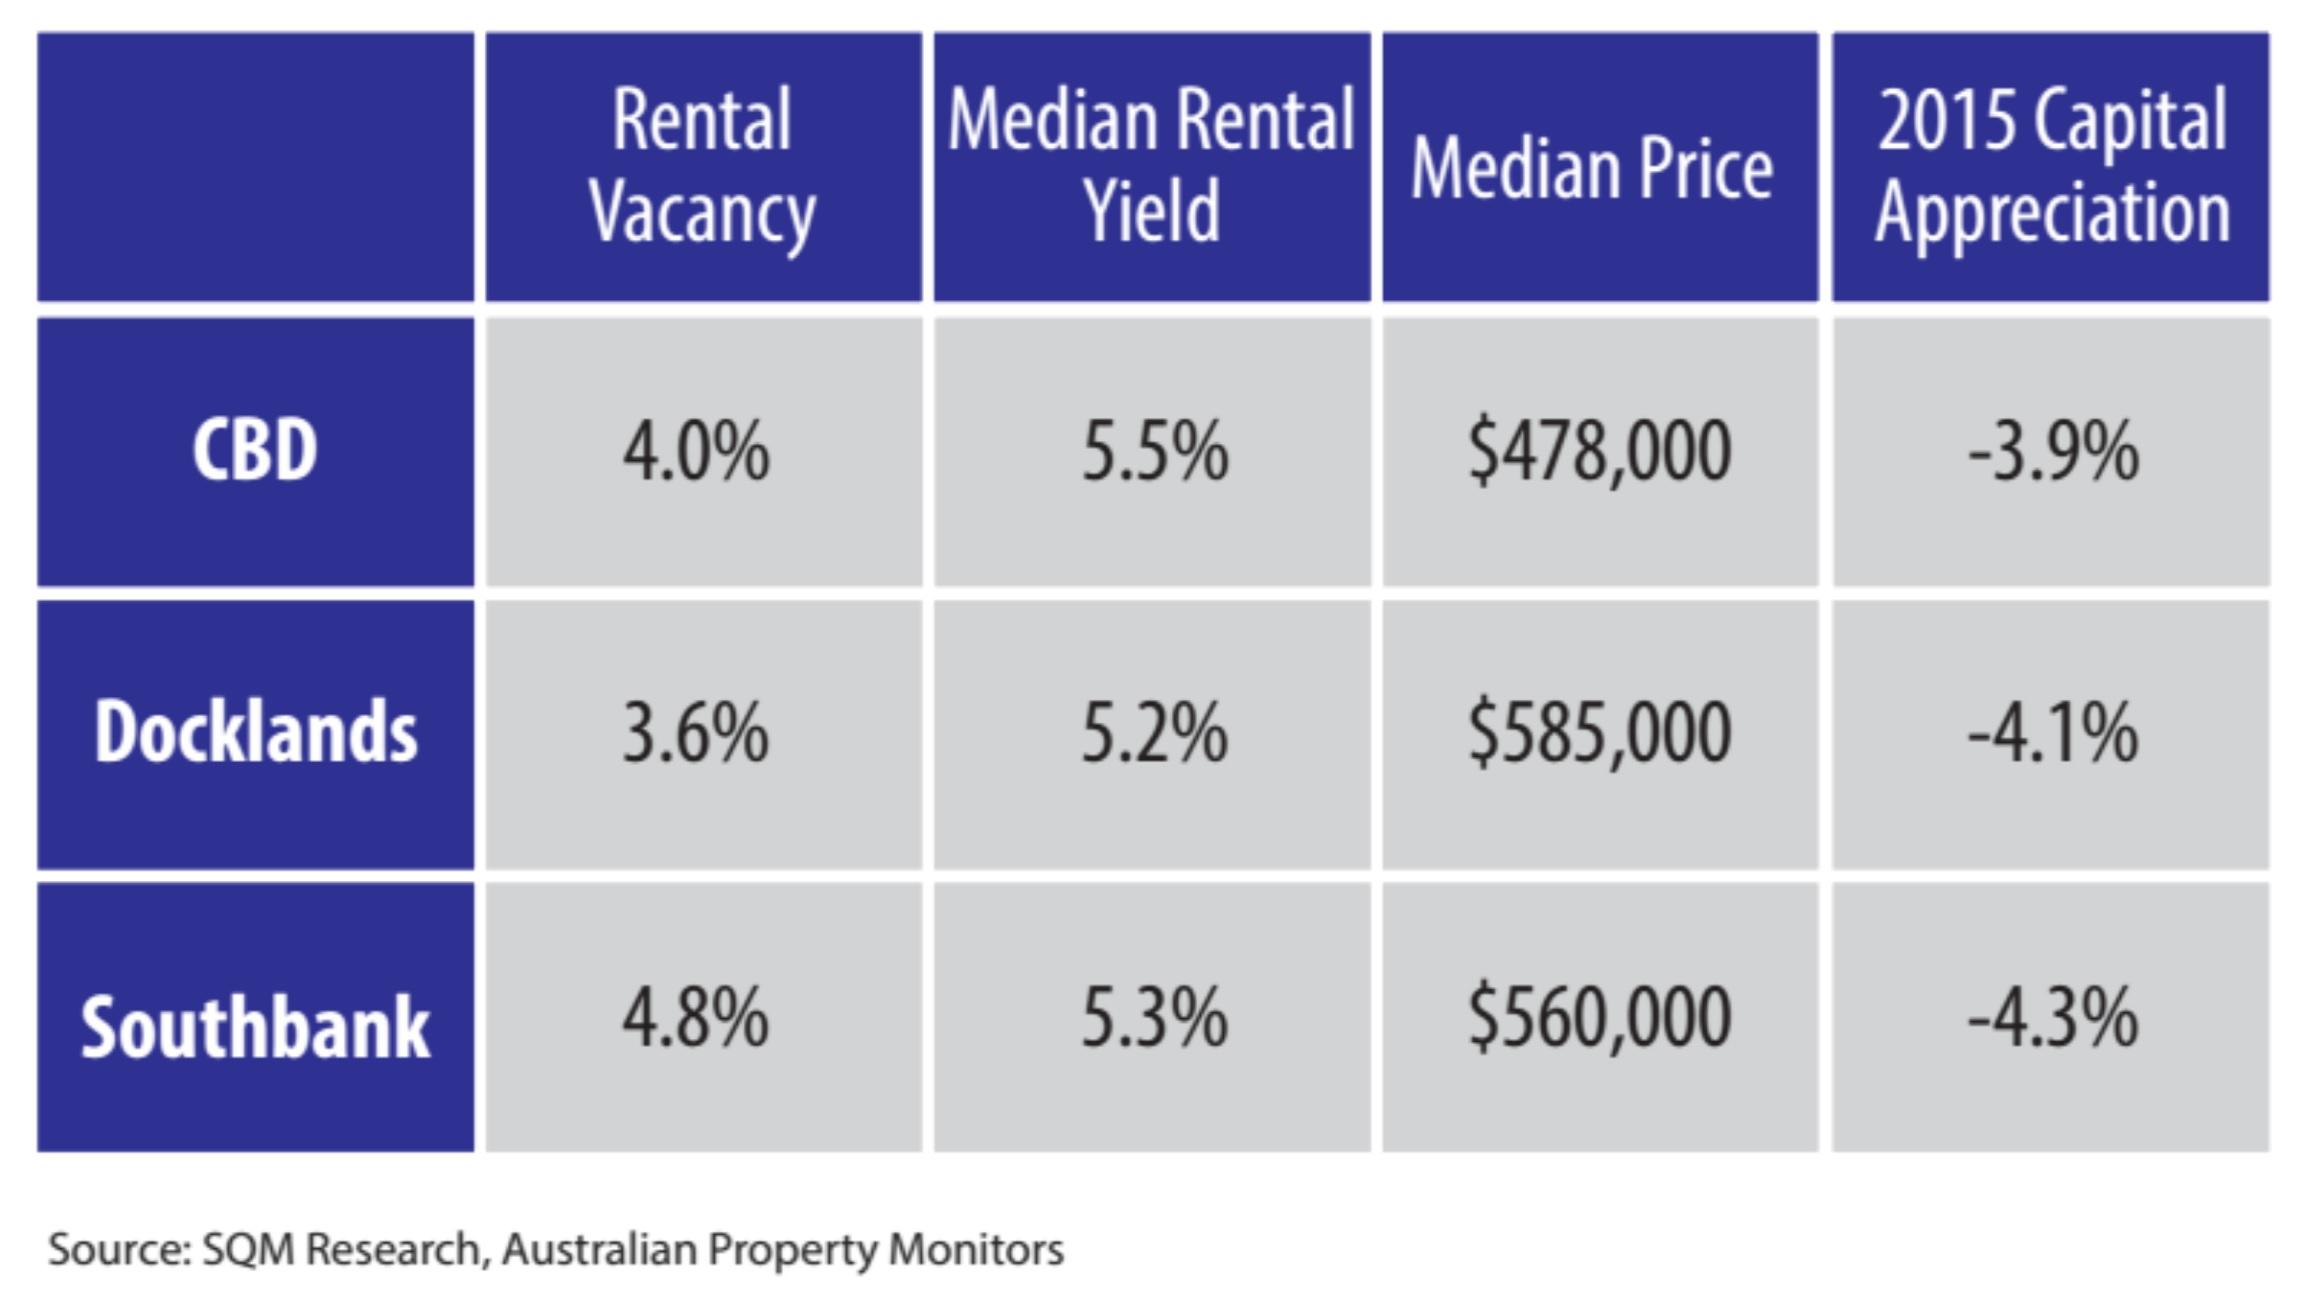 CBD Melbourne Stats